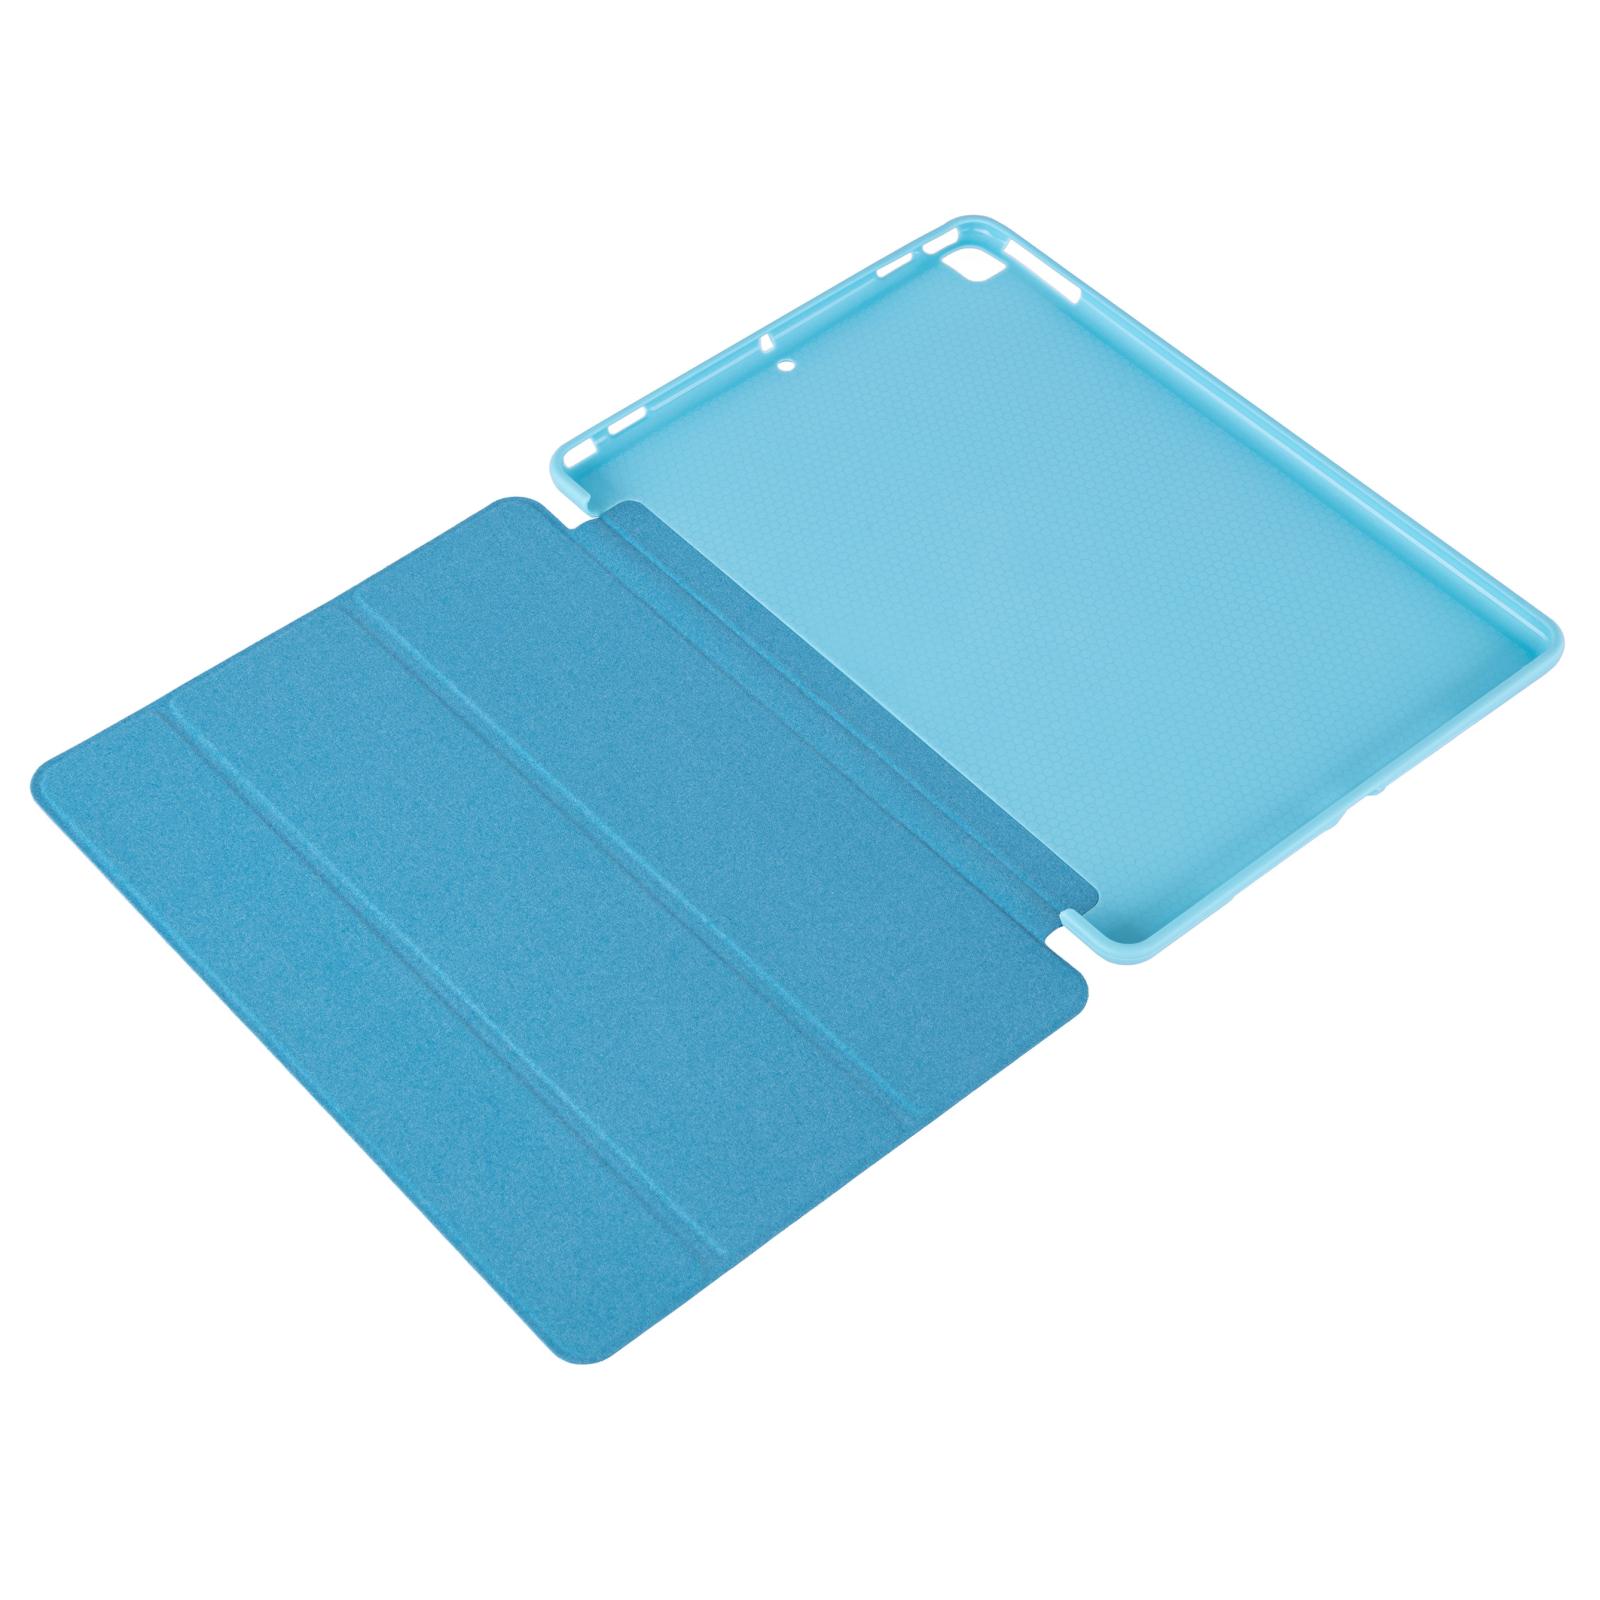 Чохол до планшета 2E Basic Apple iPad 10.2` 2019, Flex, Red (2E-IPAD-10.2-19-IKFX-RD) зображення 4